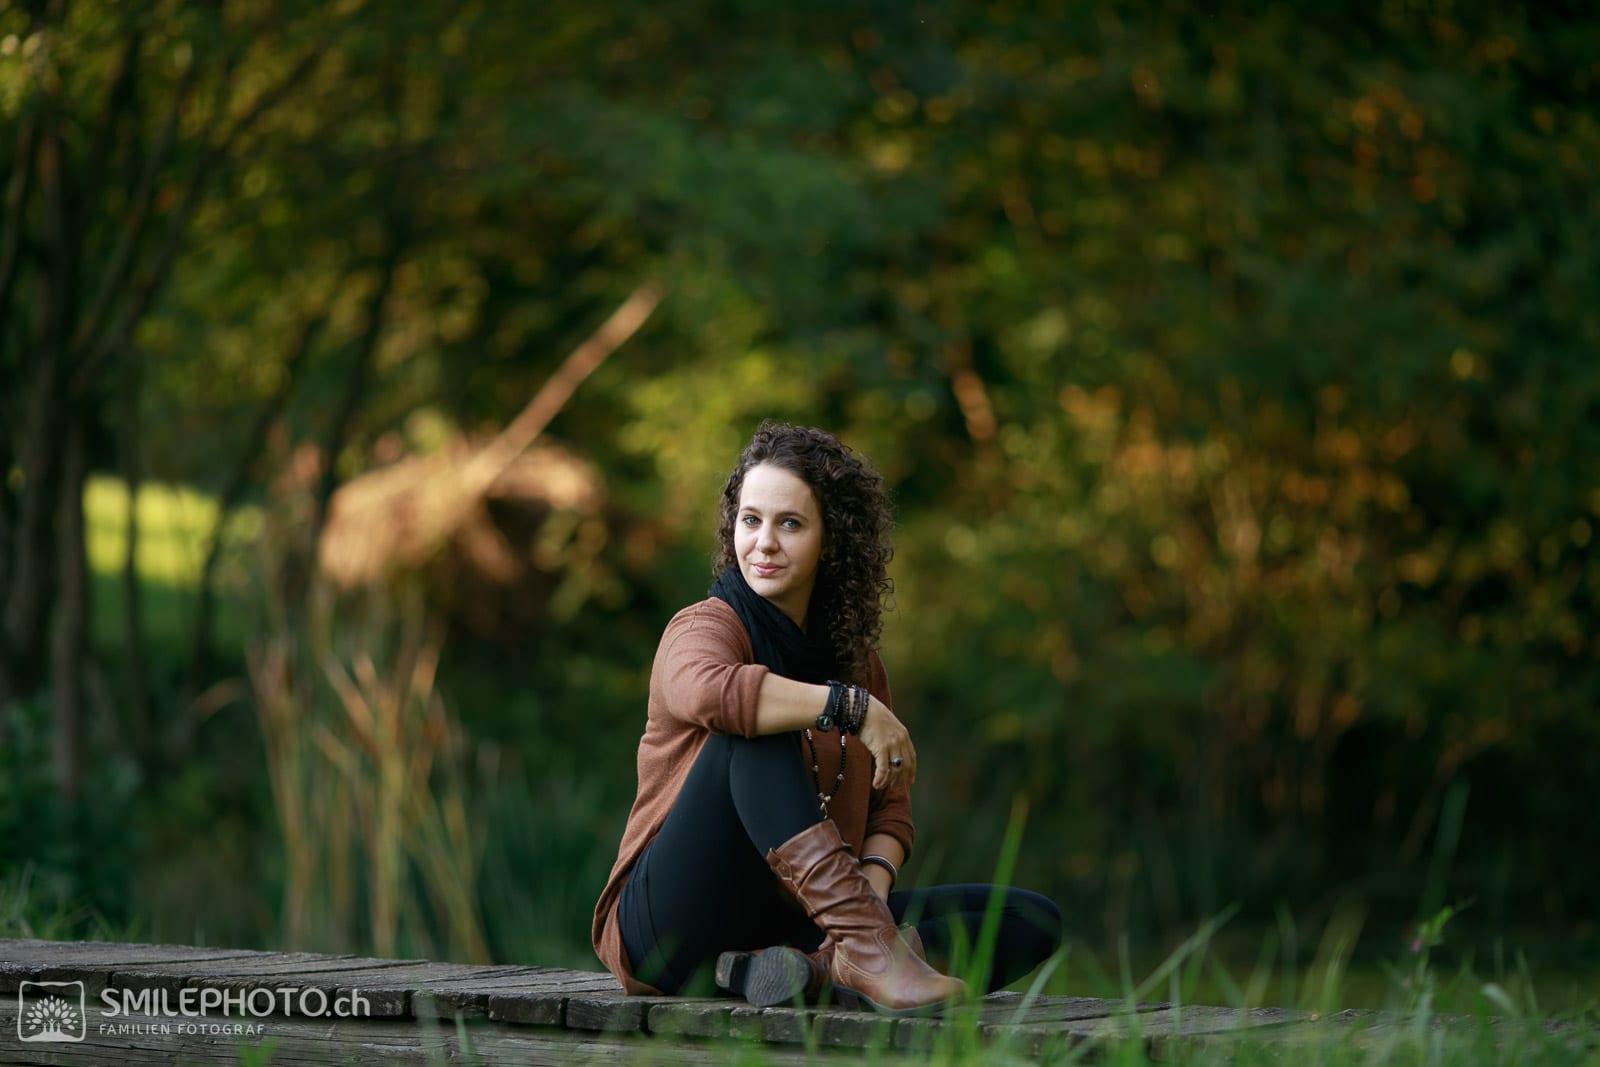 Portraitfotografie 1